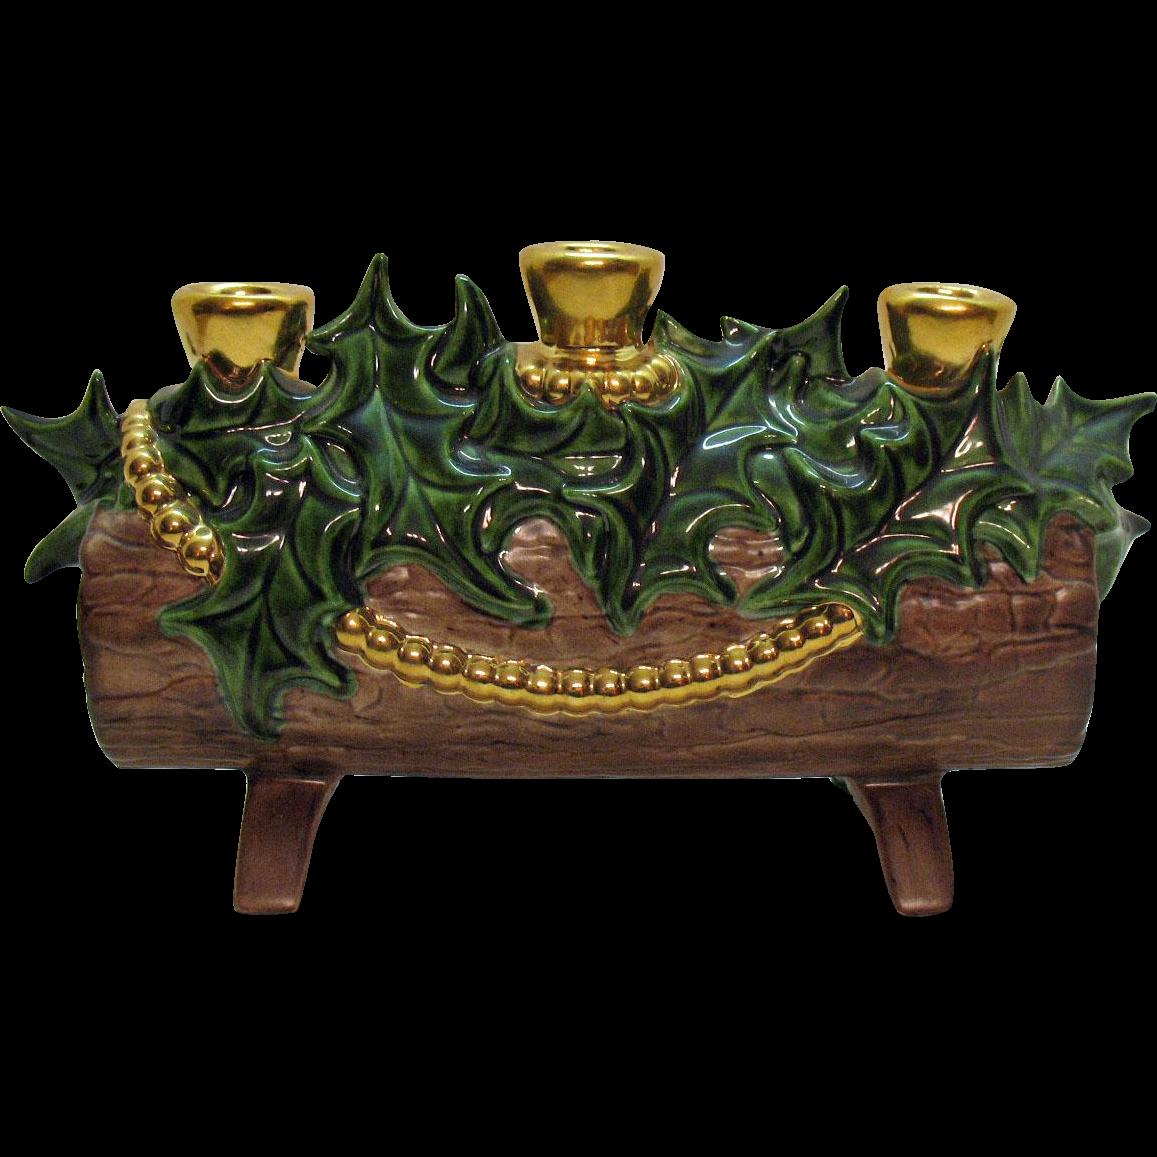 Vintage Ceramic Candle Holder Log Atlantic Mold 1970s Good Vintage Condition